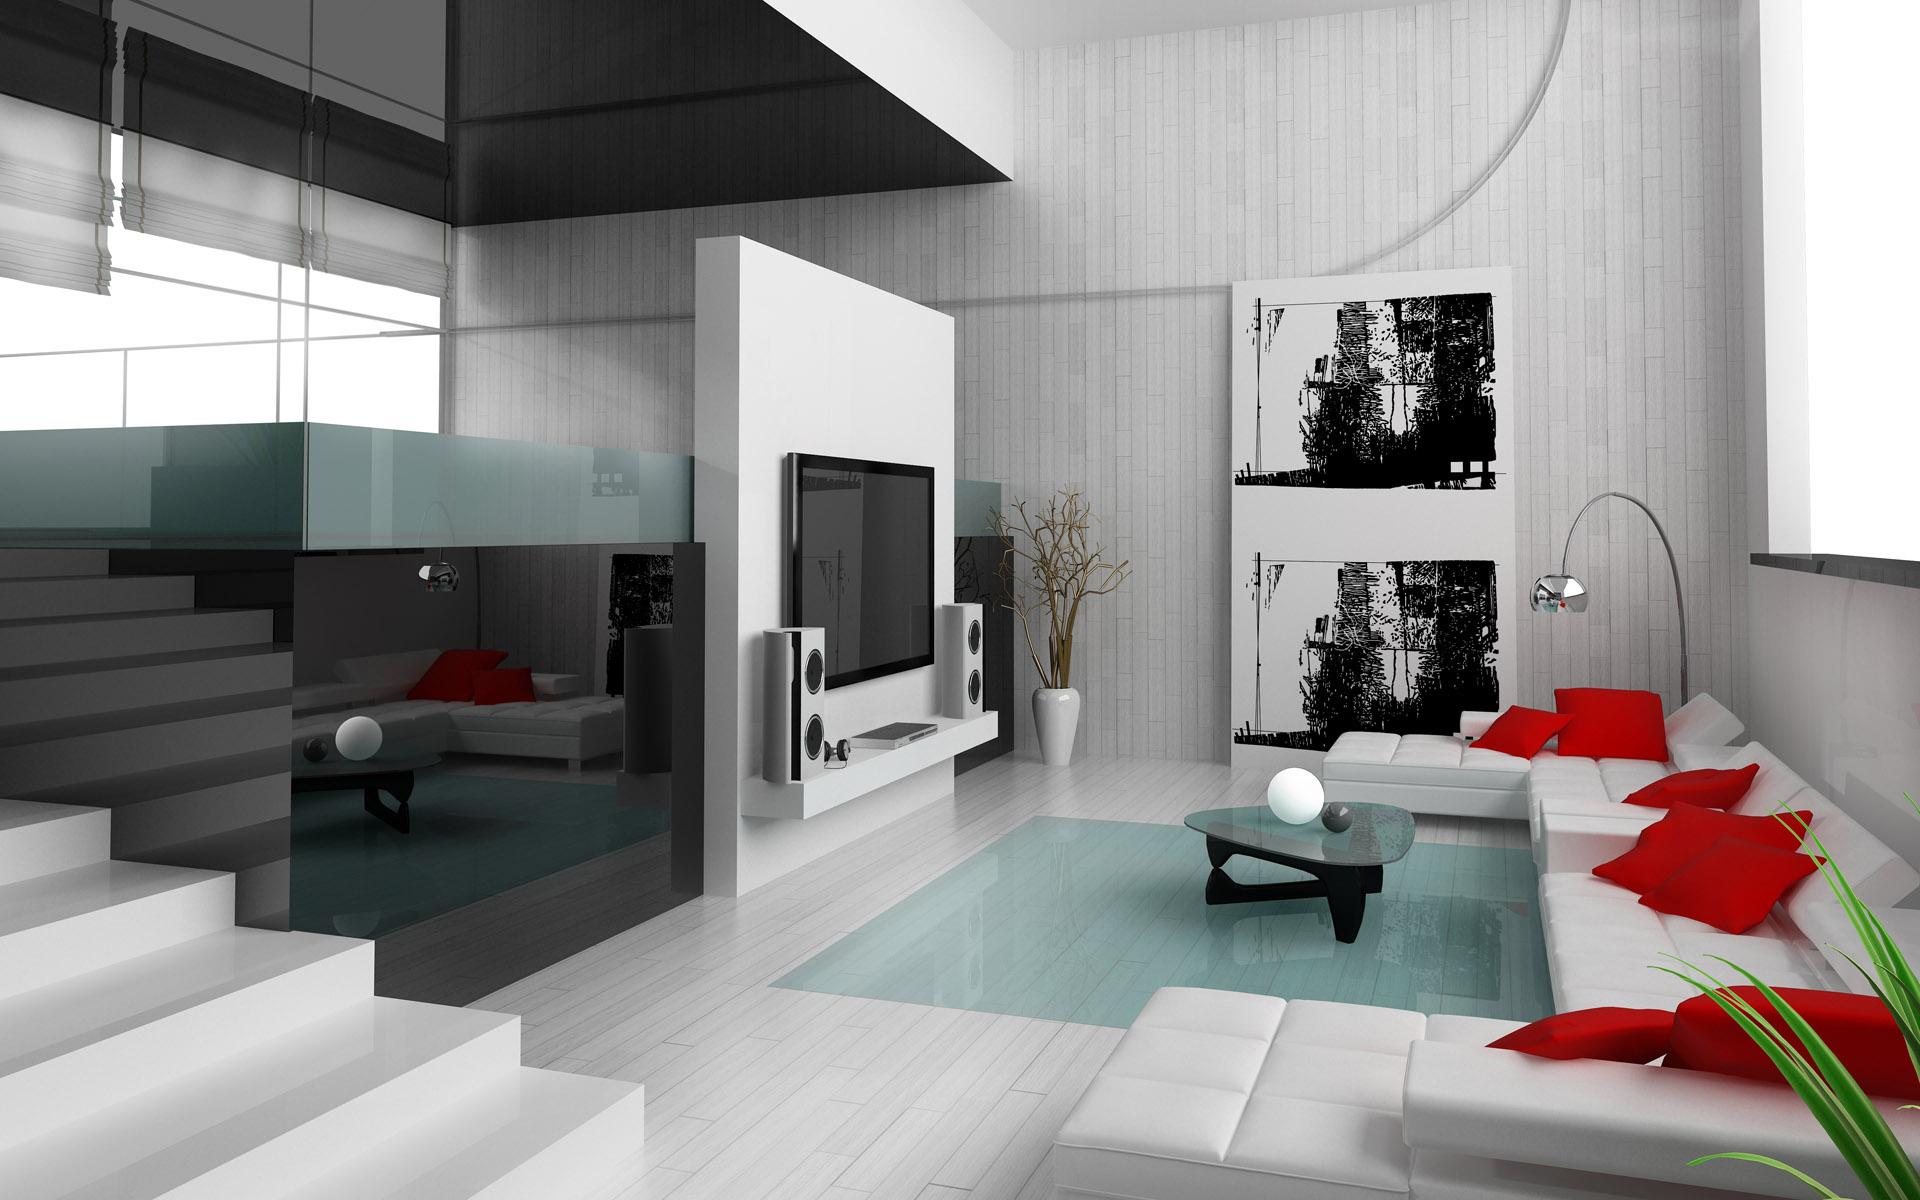 Apartment Wallpaper 1586 HD Wallpaper 3D Desktop Backgrounds 1920x1200